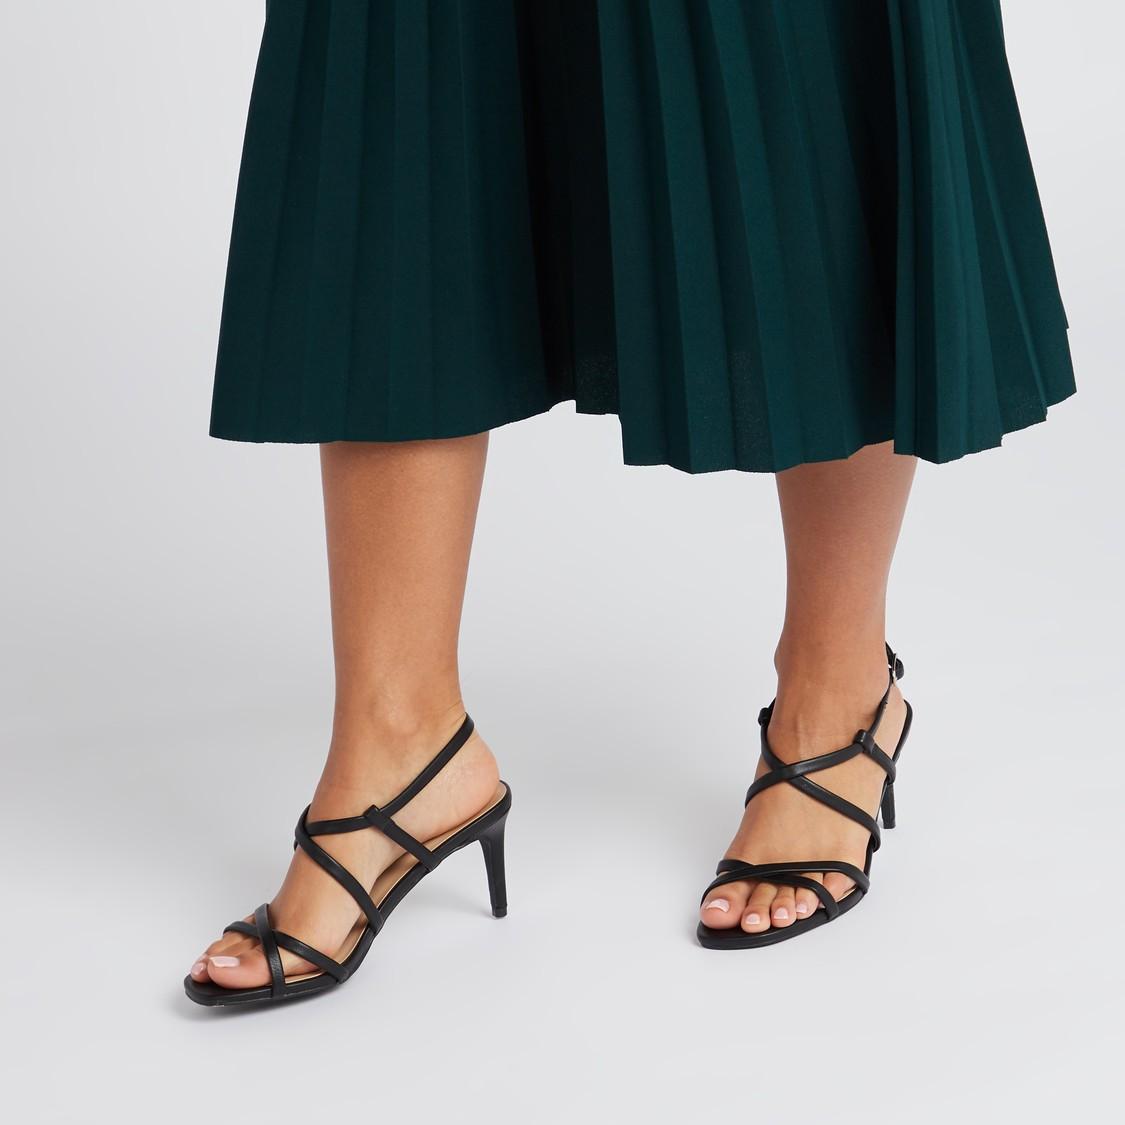 Solid Heel Sandals with Buckle Closure